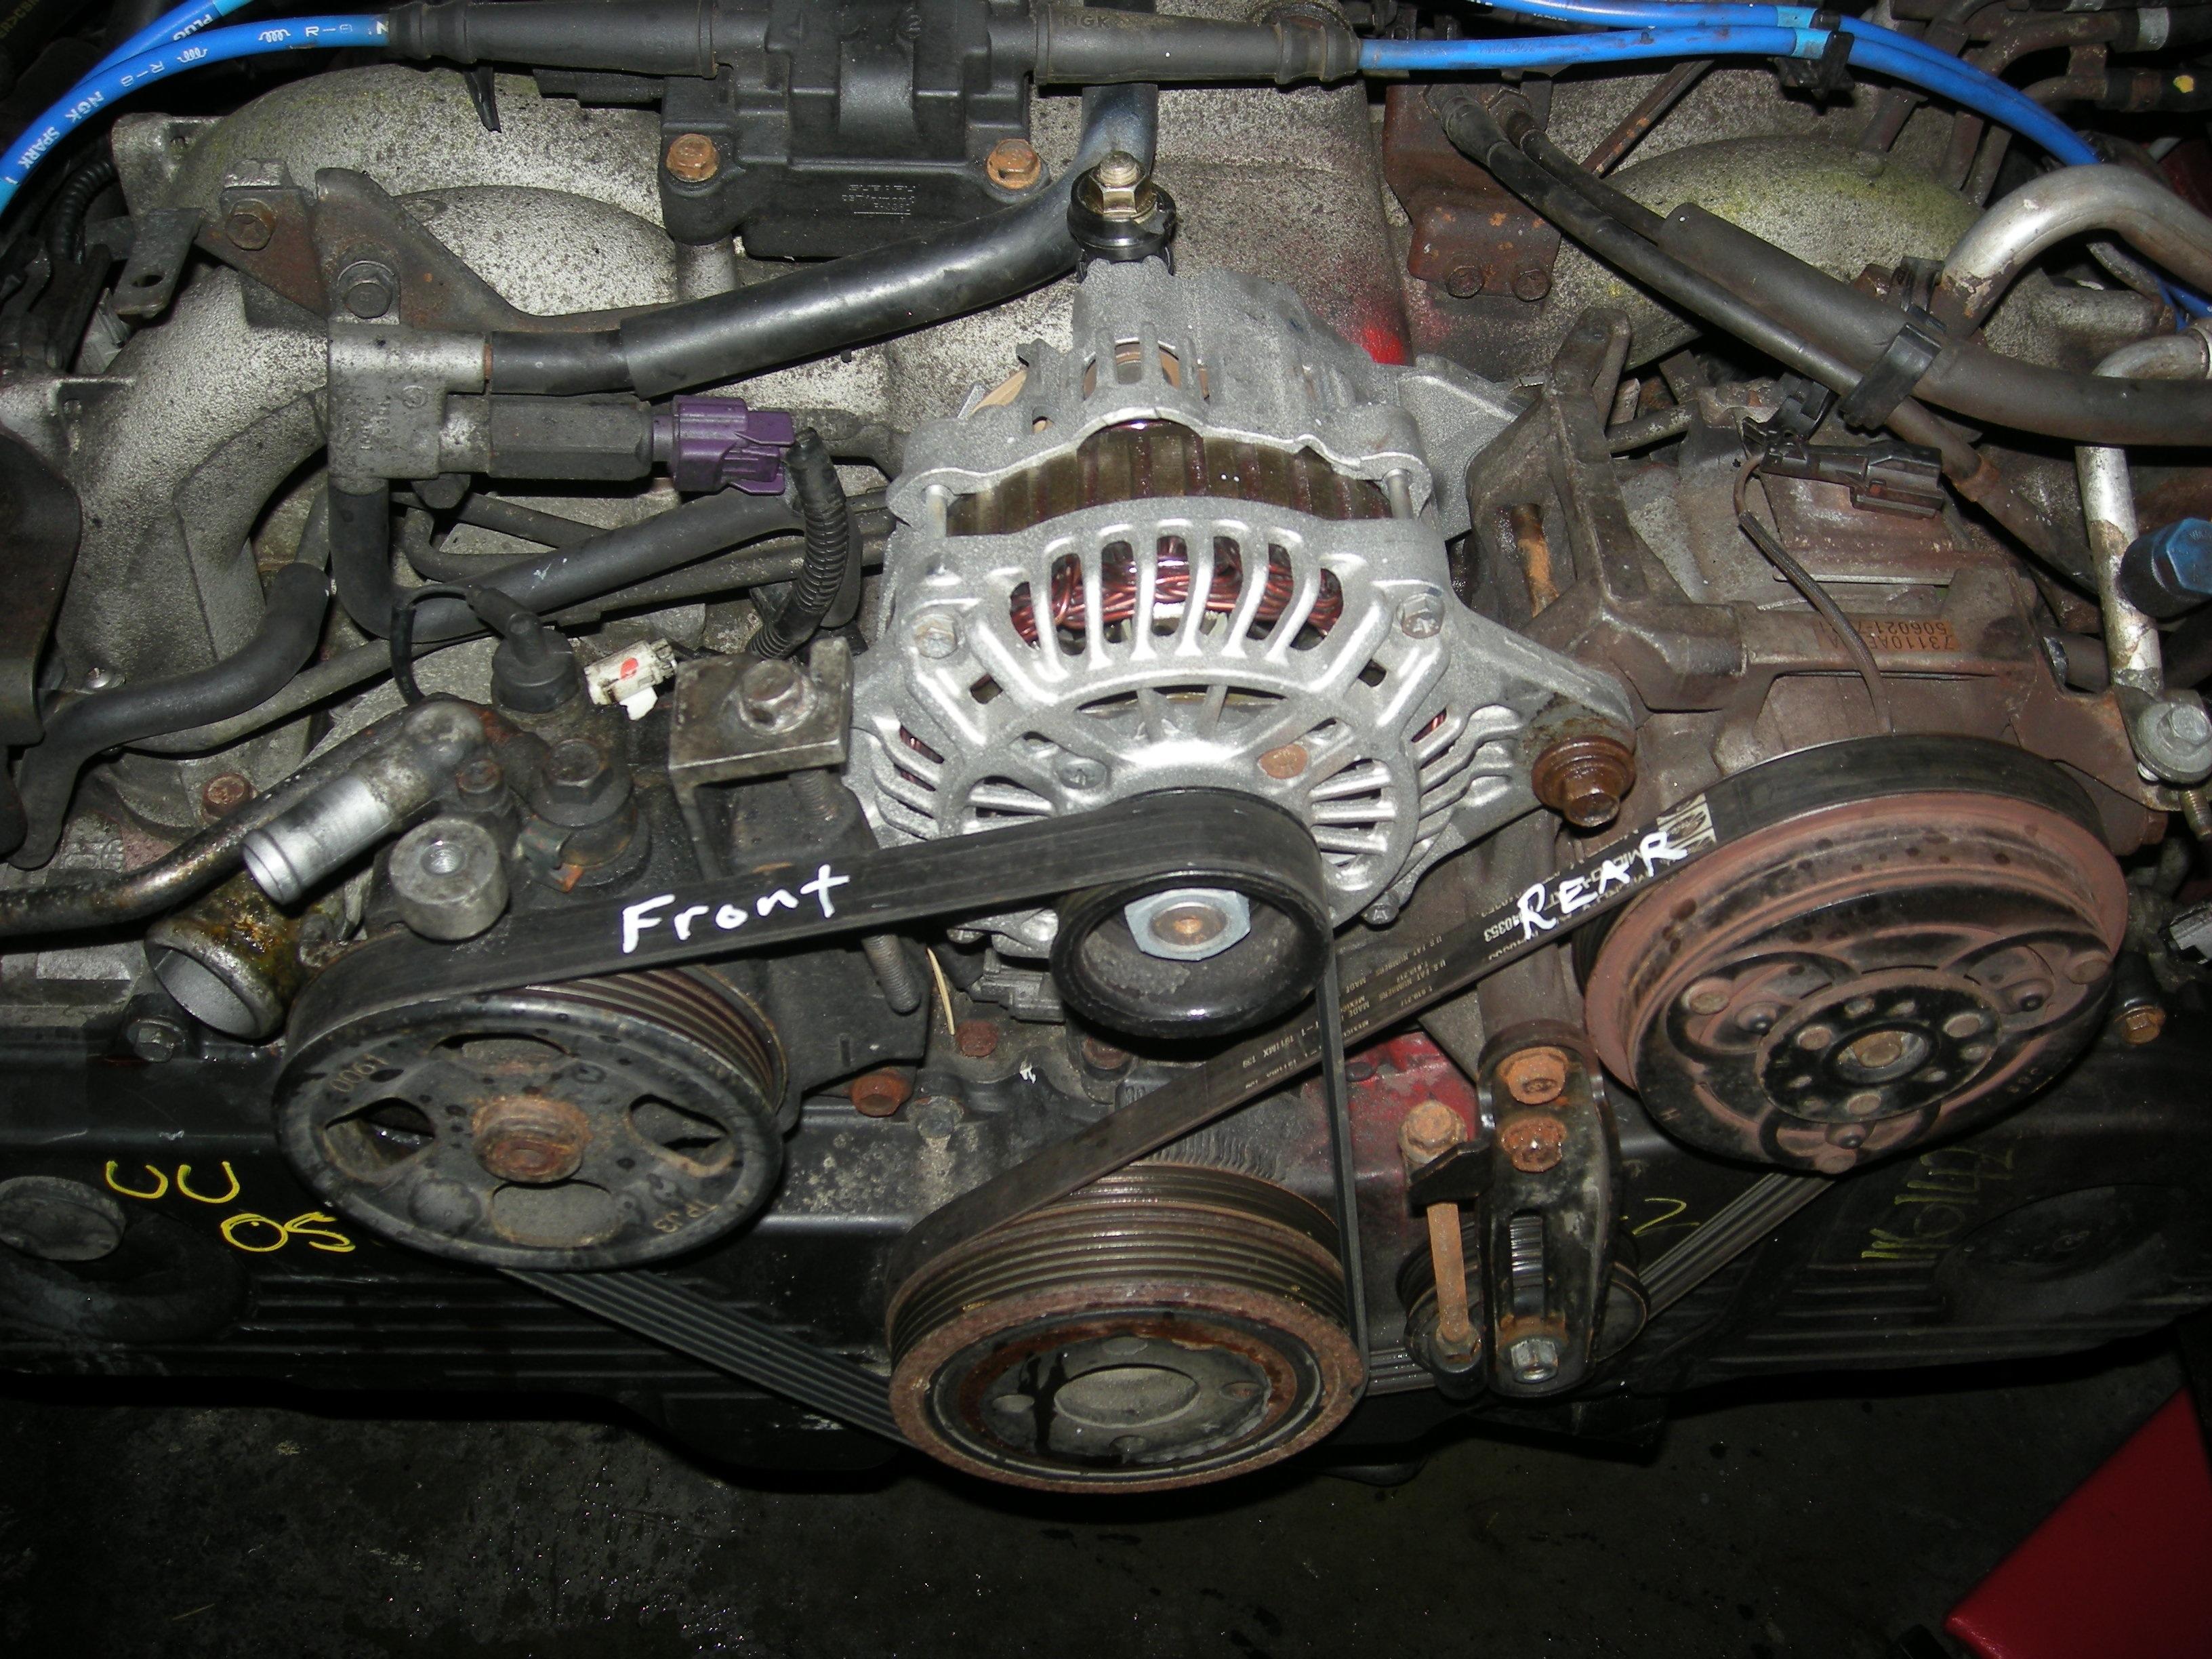 hight resolution of subaru boxer engine belt diagram wiring diagram source subaru 2 0 boxer engine diagram subaru boxer 4 engine fwd trans diagram